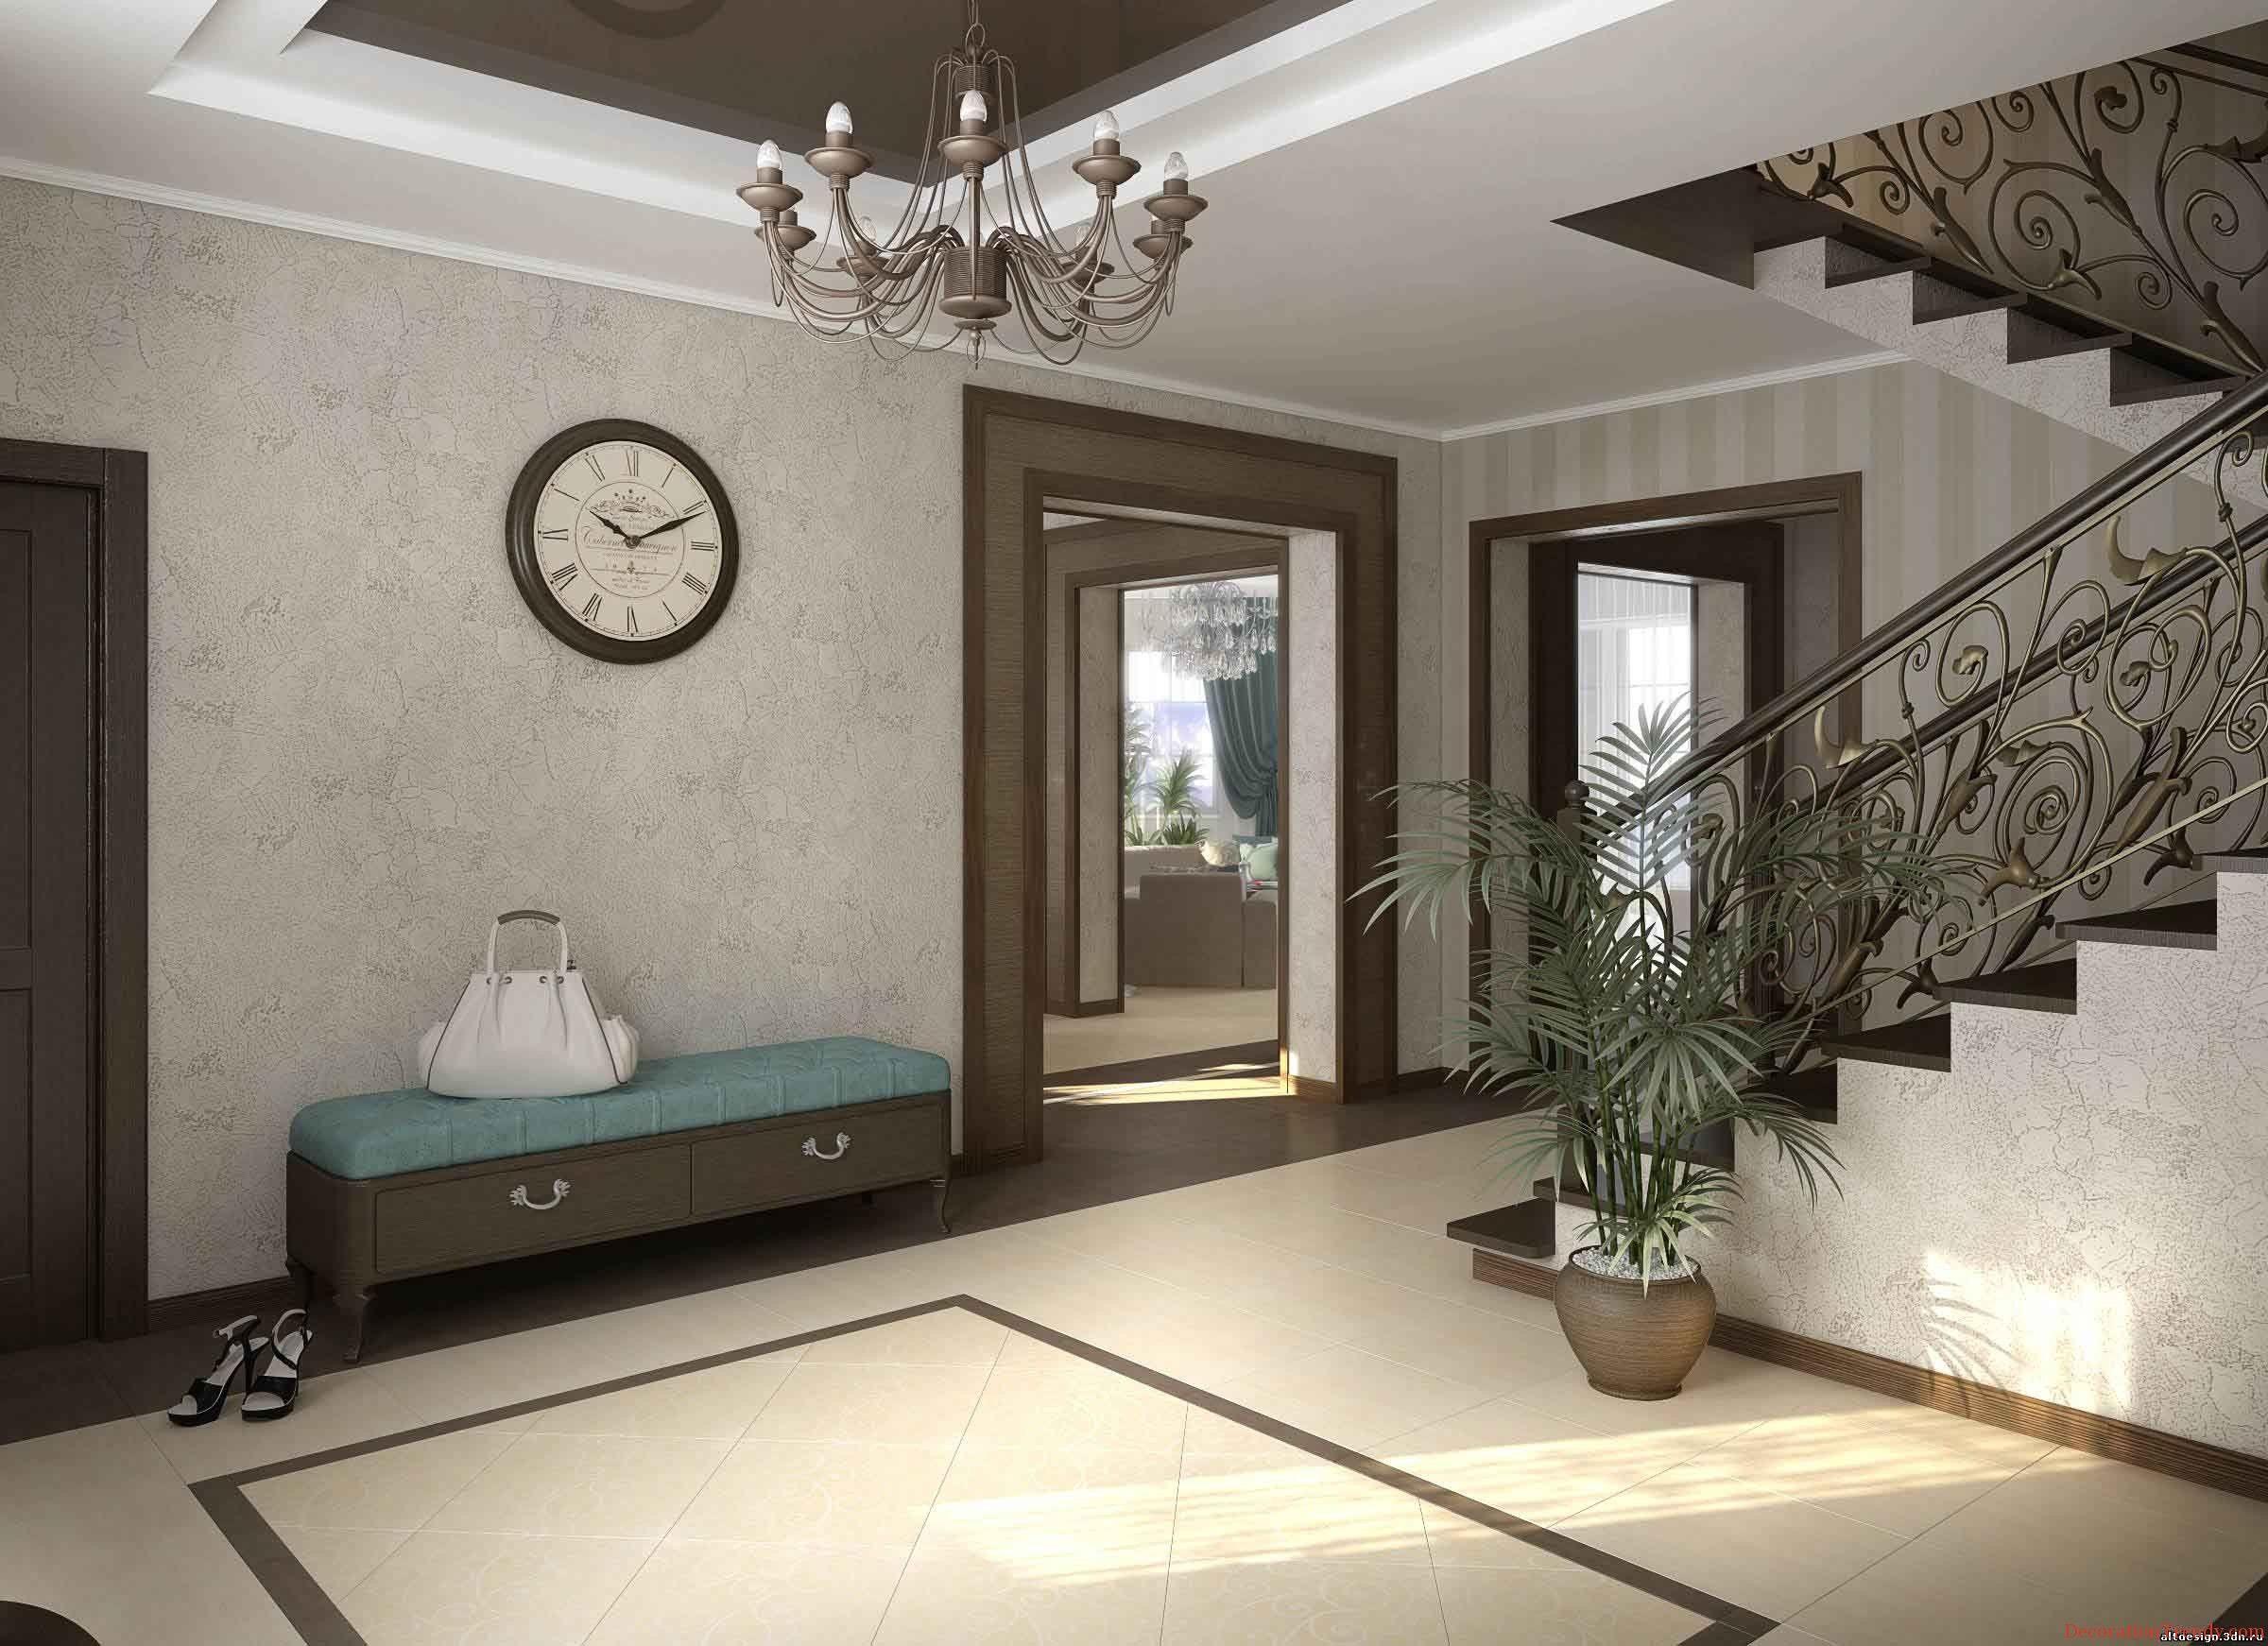 Image of: Modern Hallway Decorating Ideas | Visit http://www.suomenlvis.fi/